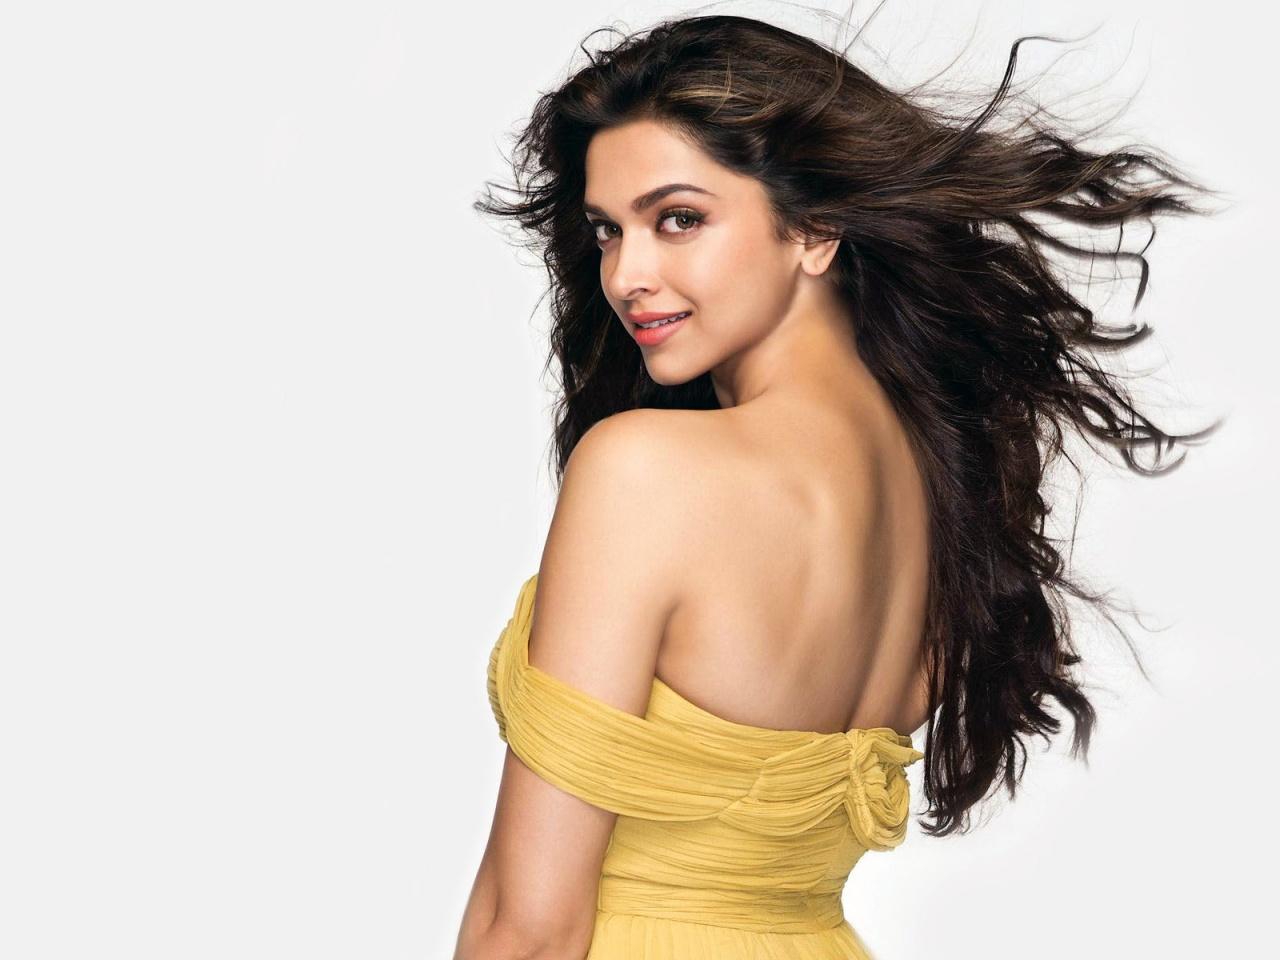 Bollywood Actress Deepika Padukone Hot Wallpapers Prime Wallpapers 1280x960